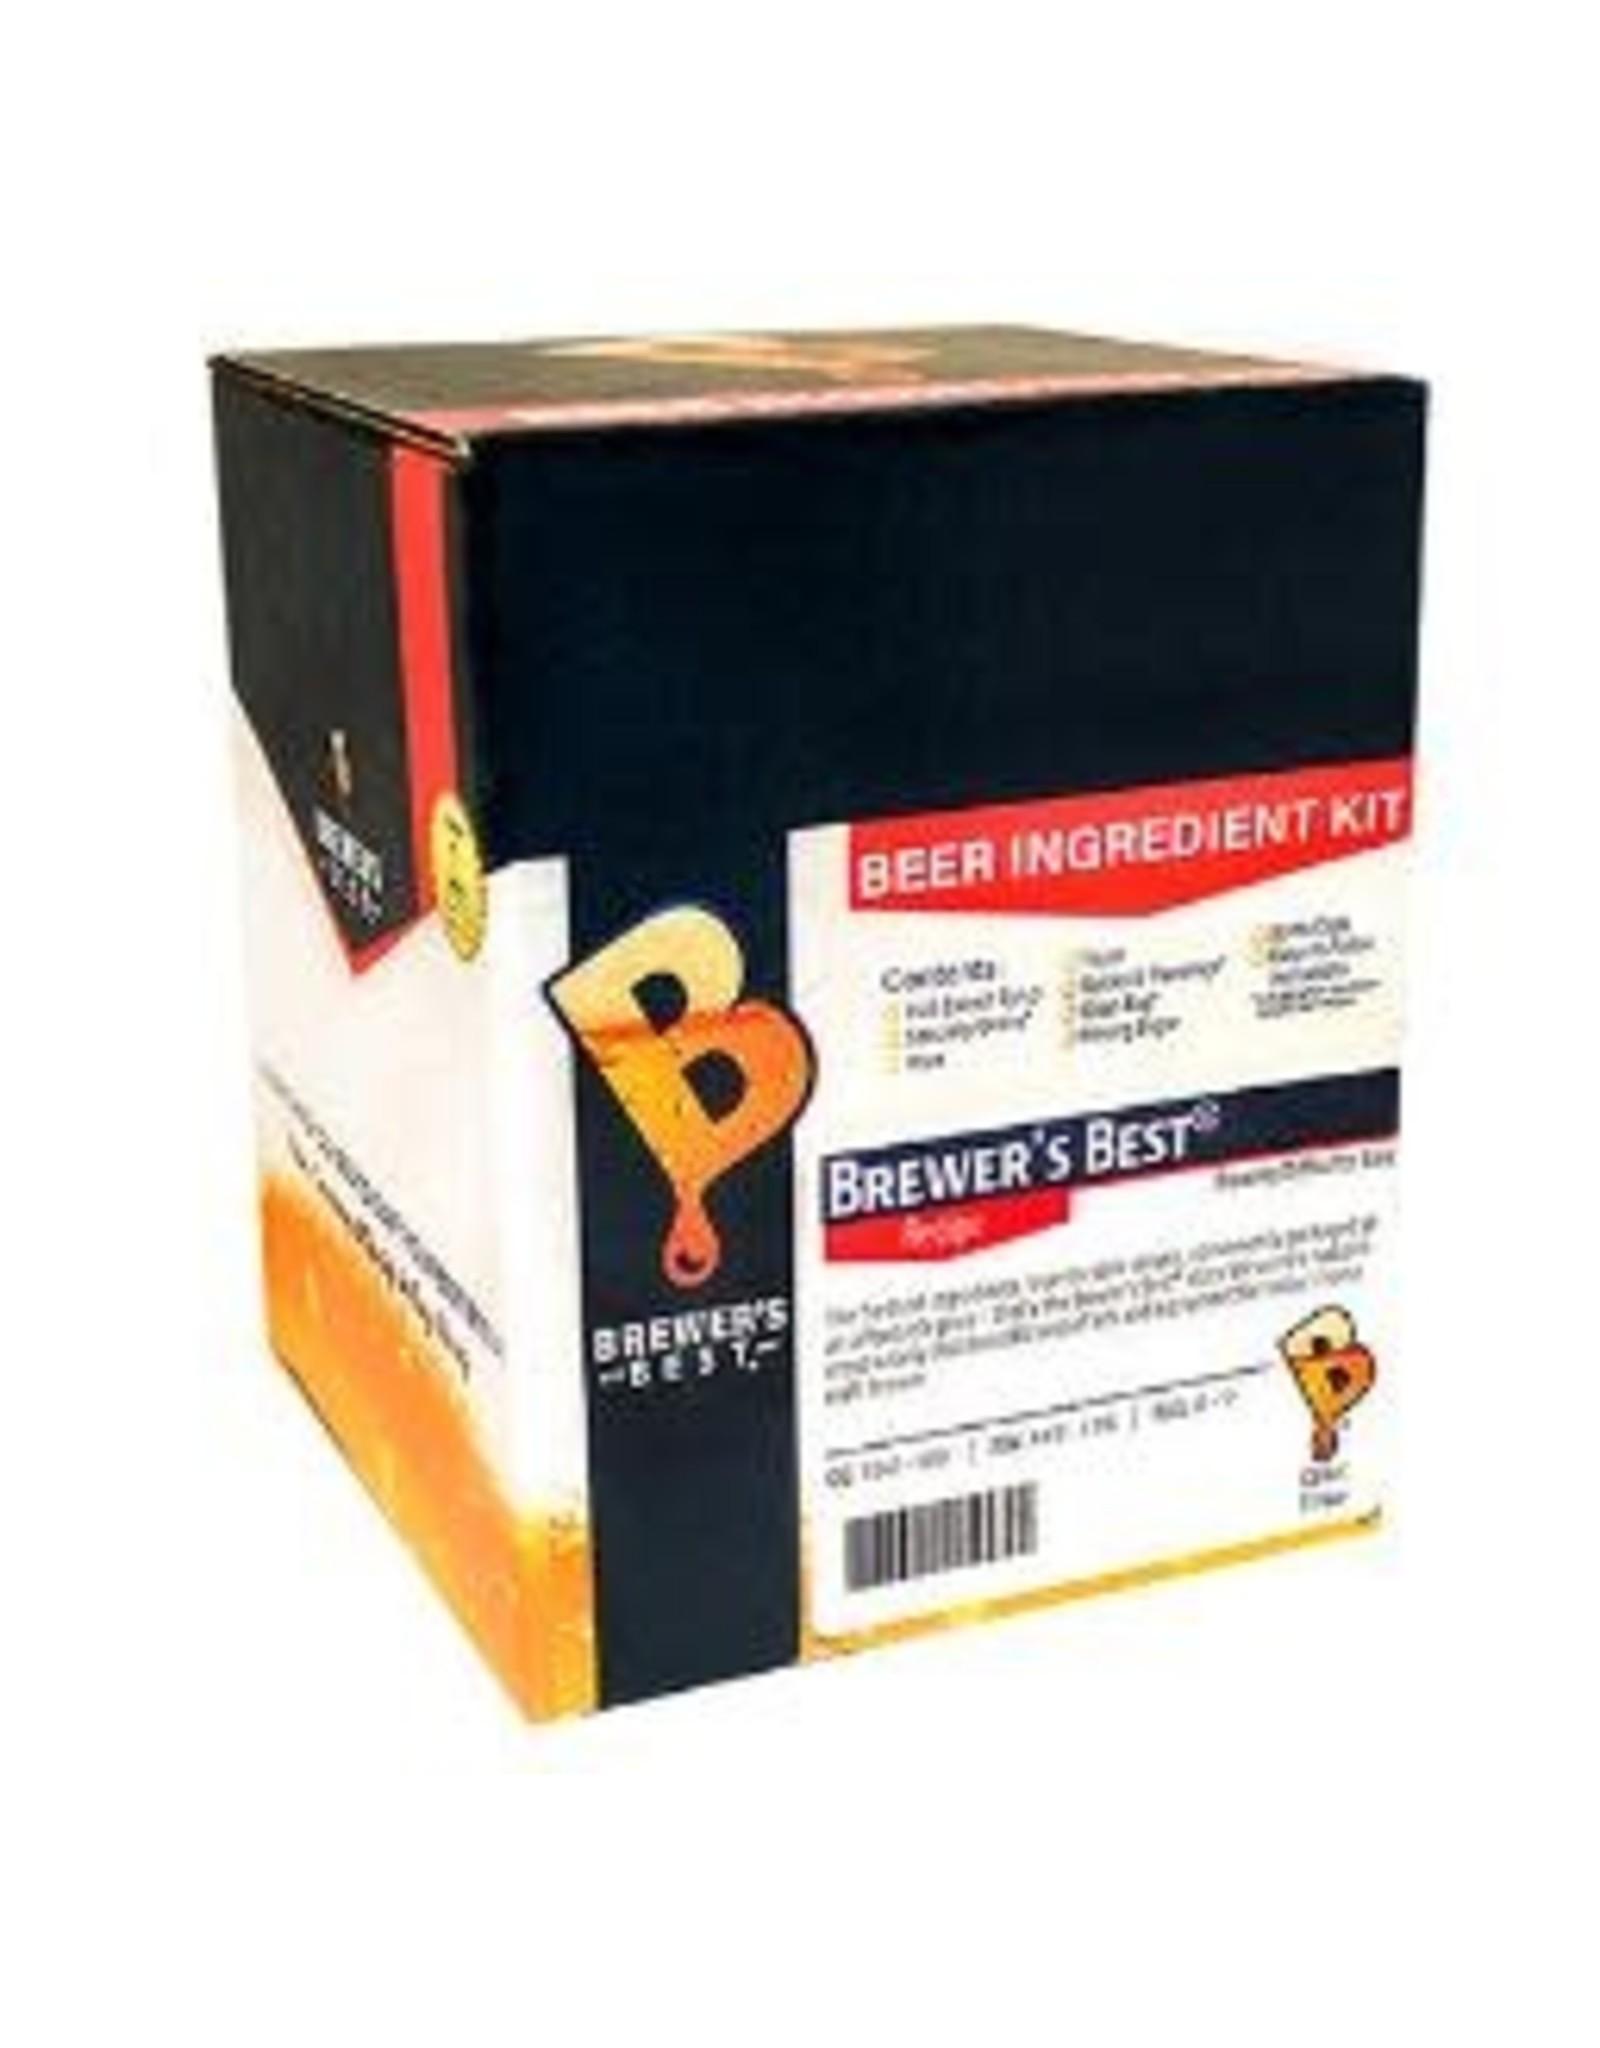 BREWERS BEST 1412 BREWERS BEST TRIPLE KIT